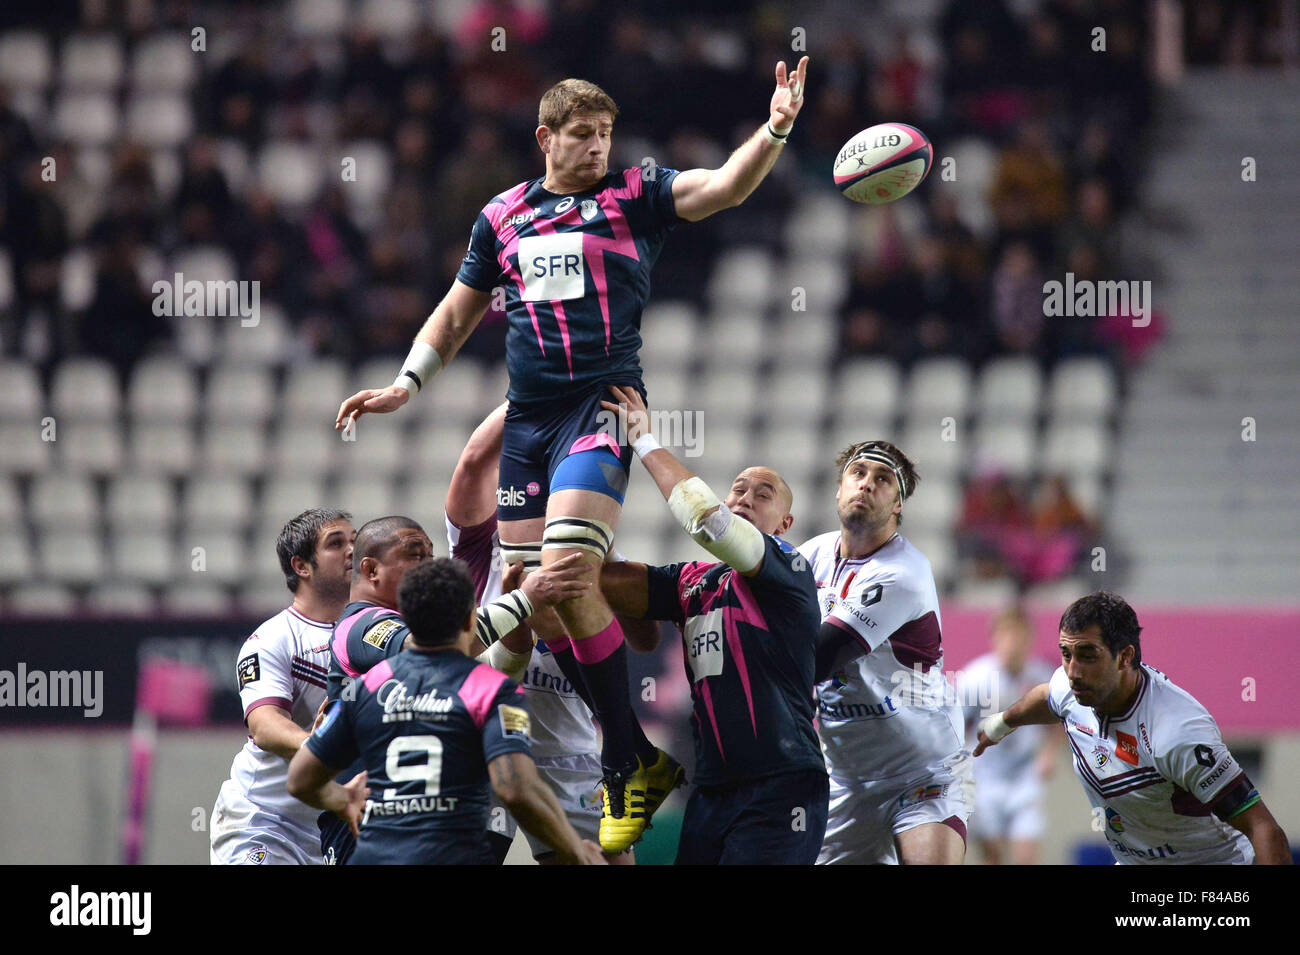 París, Francia. El 05 de diciembre de 2015. Top 14 de rugby. Stade Francais versus Bordeaux Begles. PASCAL Imagen De Stock